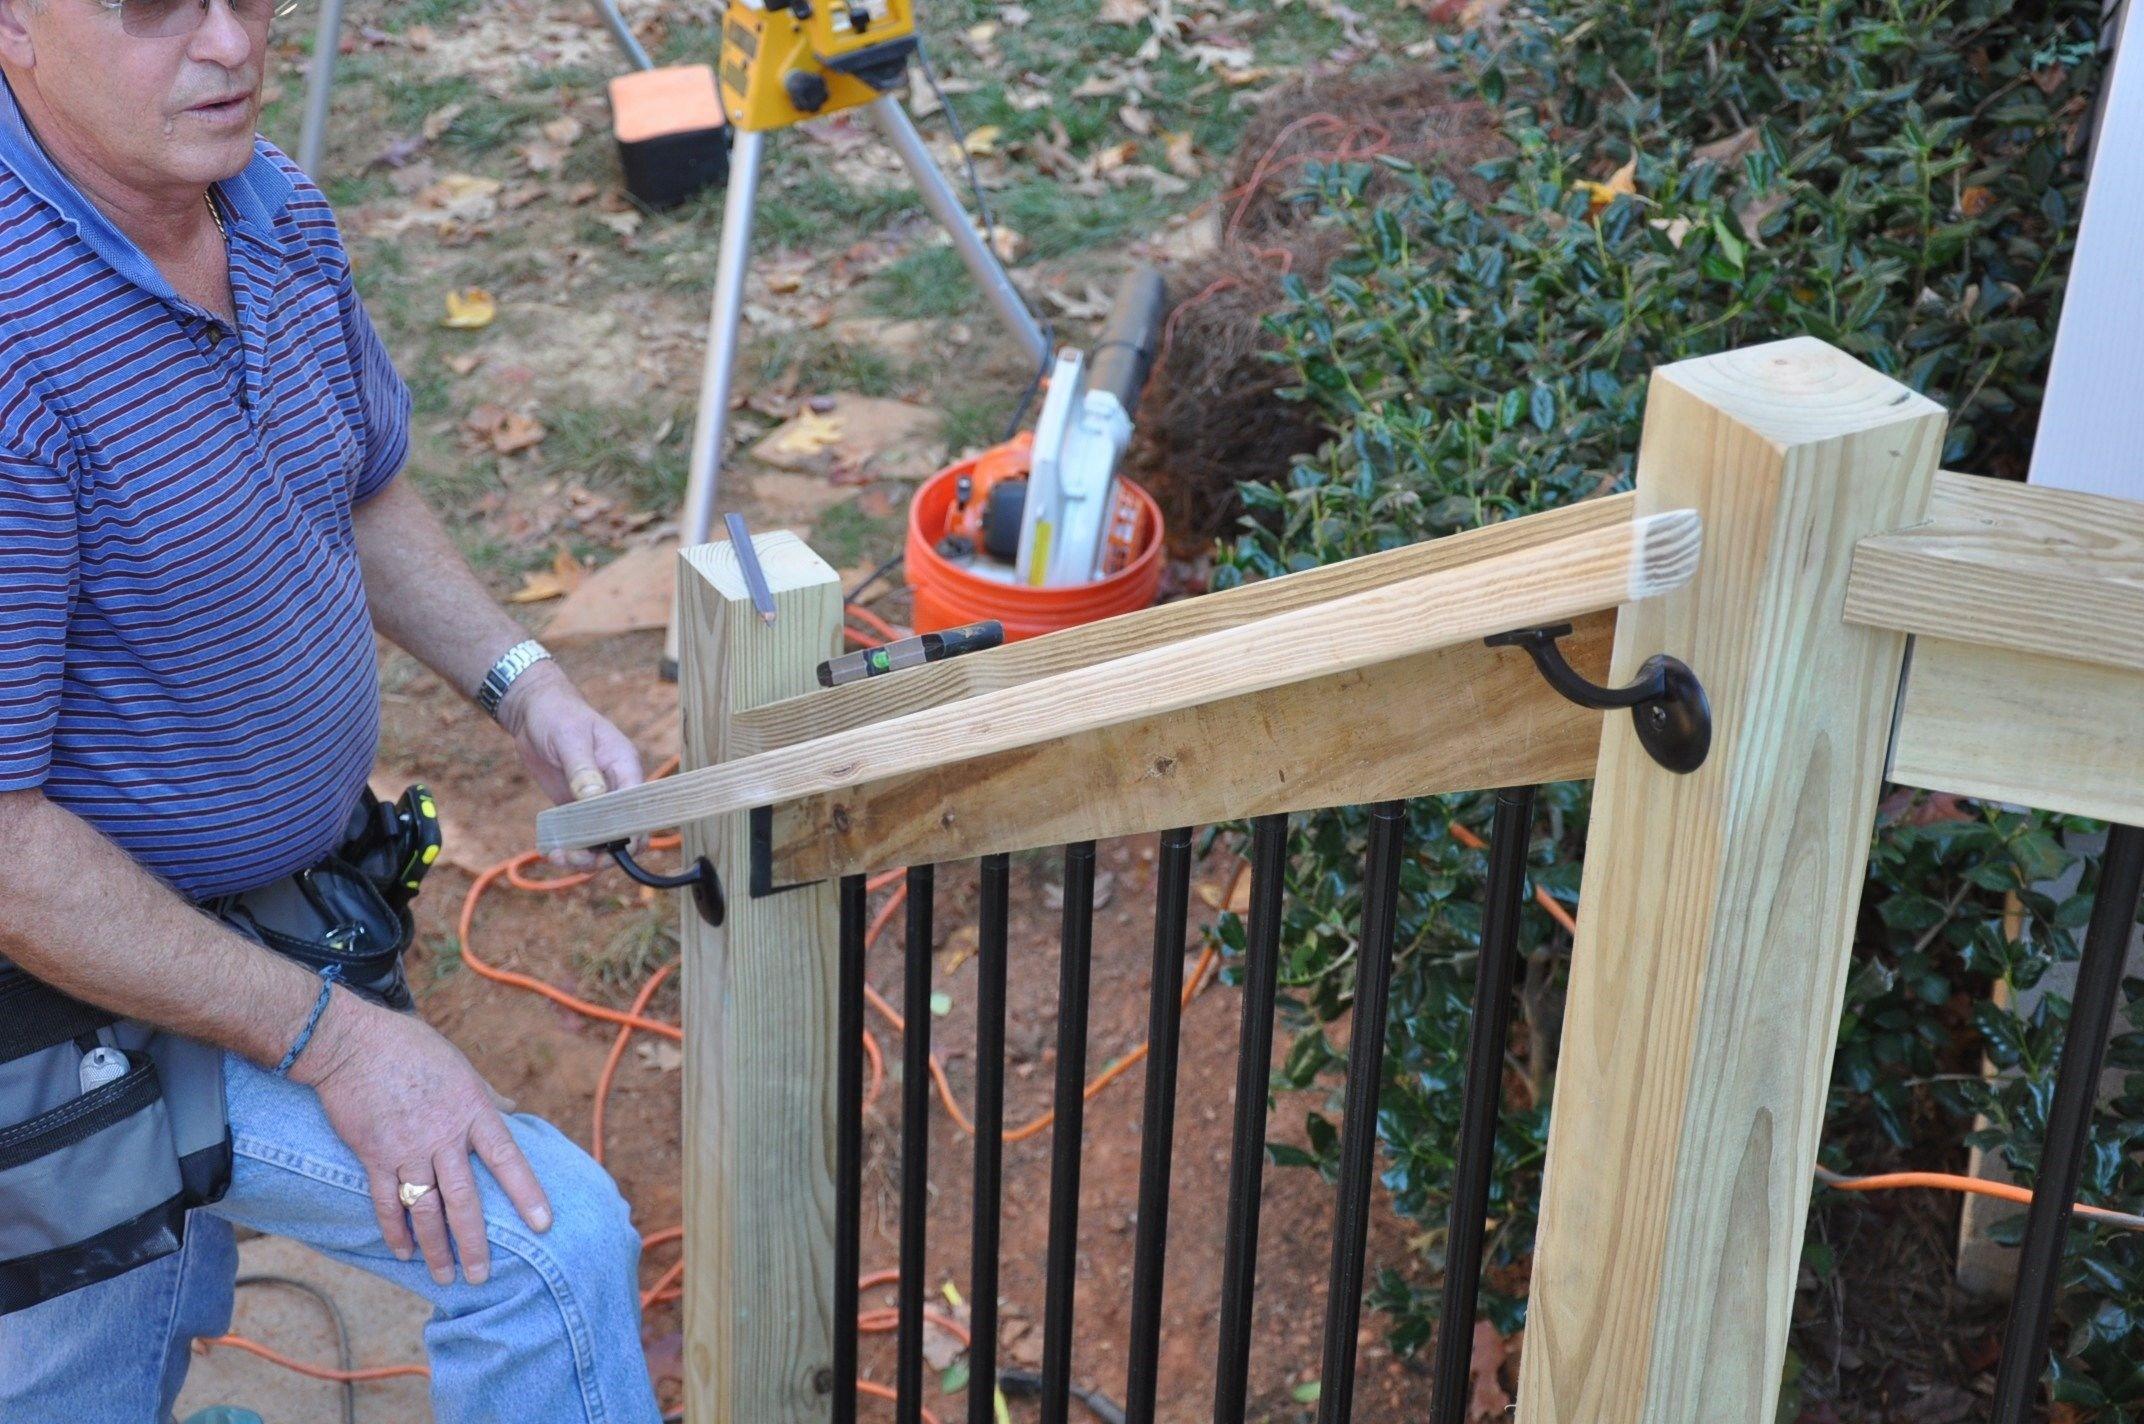 How To Install Deck Stair Railings Decks Com | Pressure Treated Round Handrail | Menards | Aluminum Balusters | Baluster | Cedar | Porch